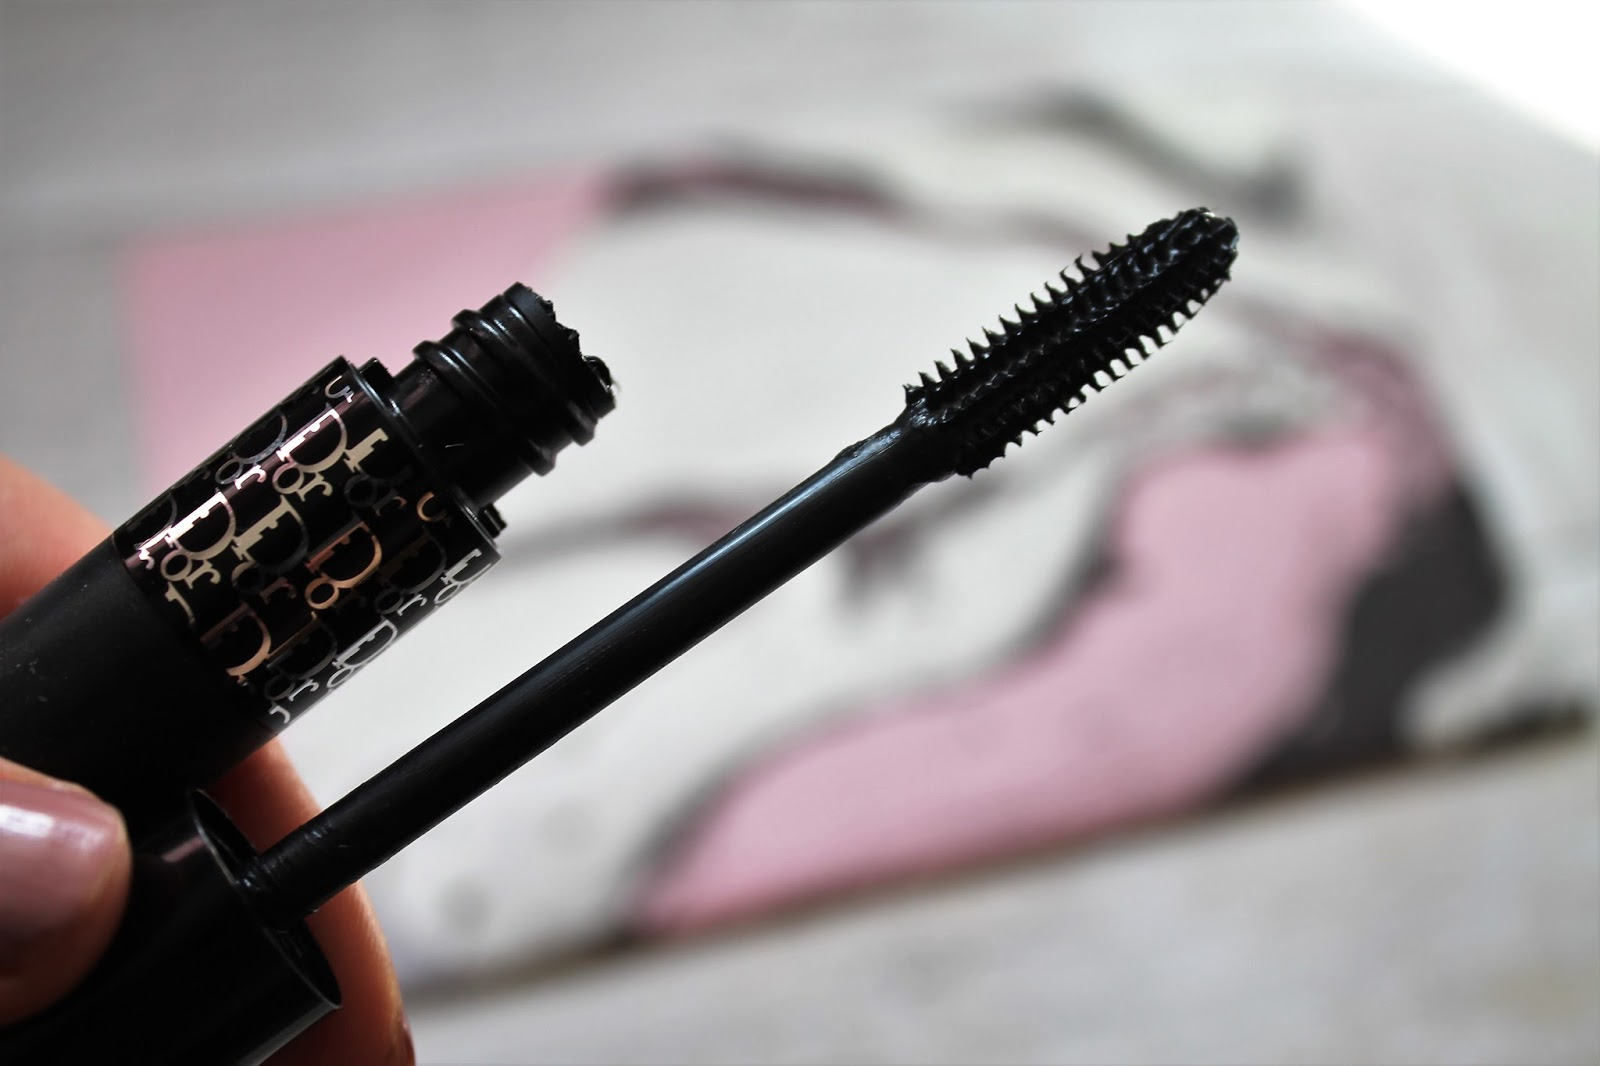 ac596435a6c Dior Diorshow Pump 'N' Volume Mascara | beekeyper